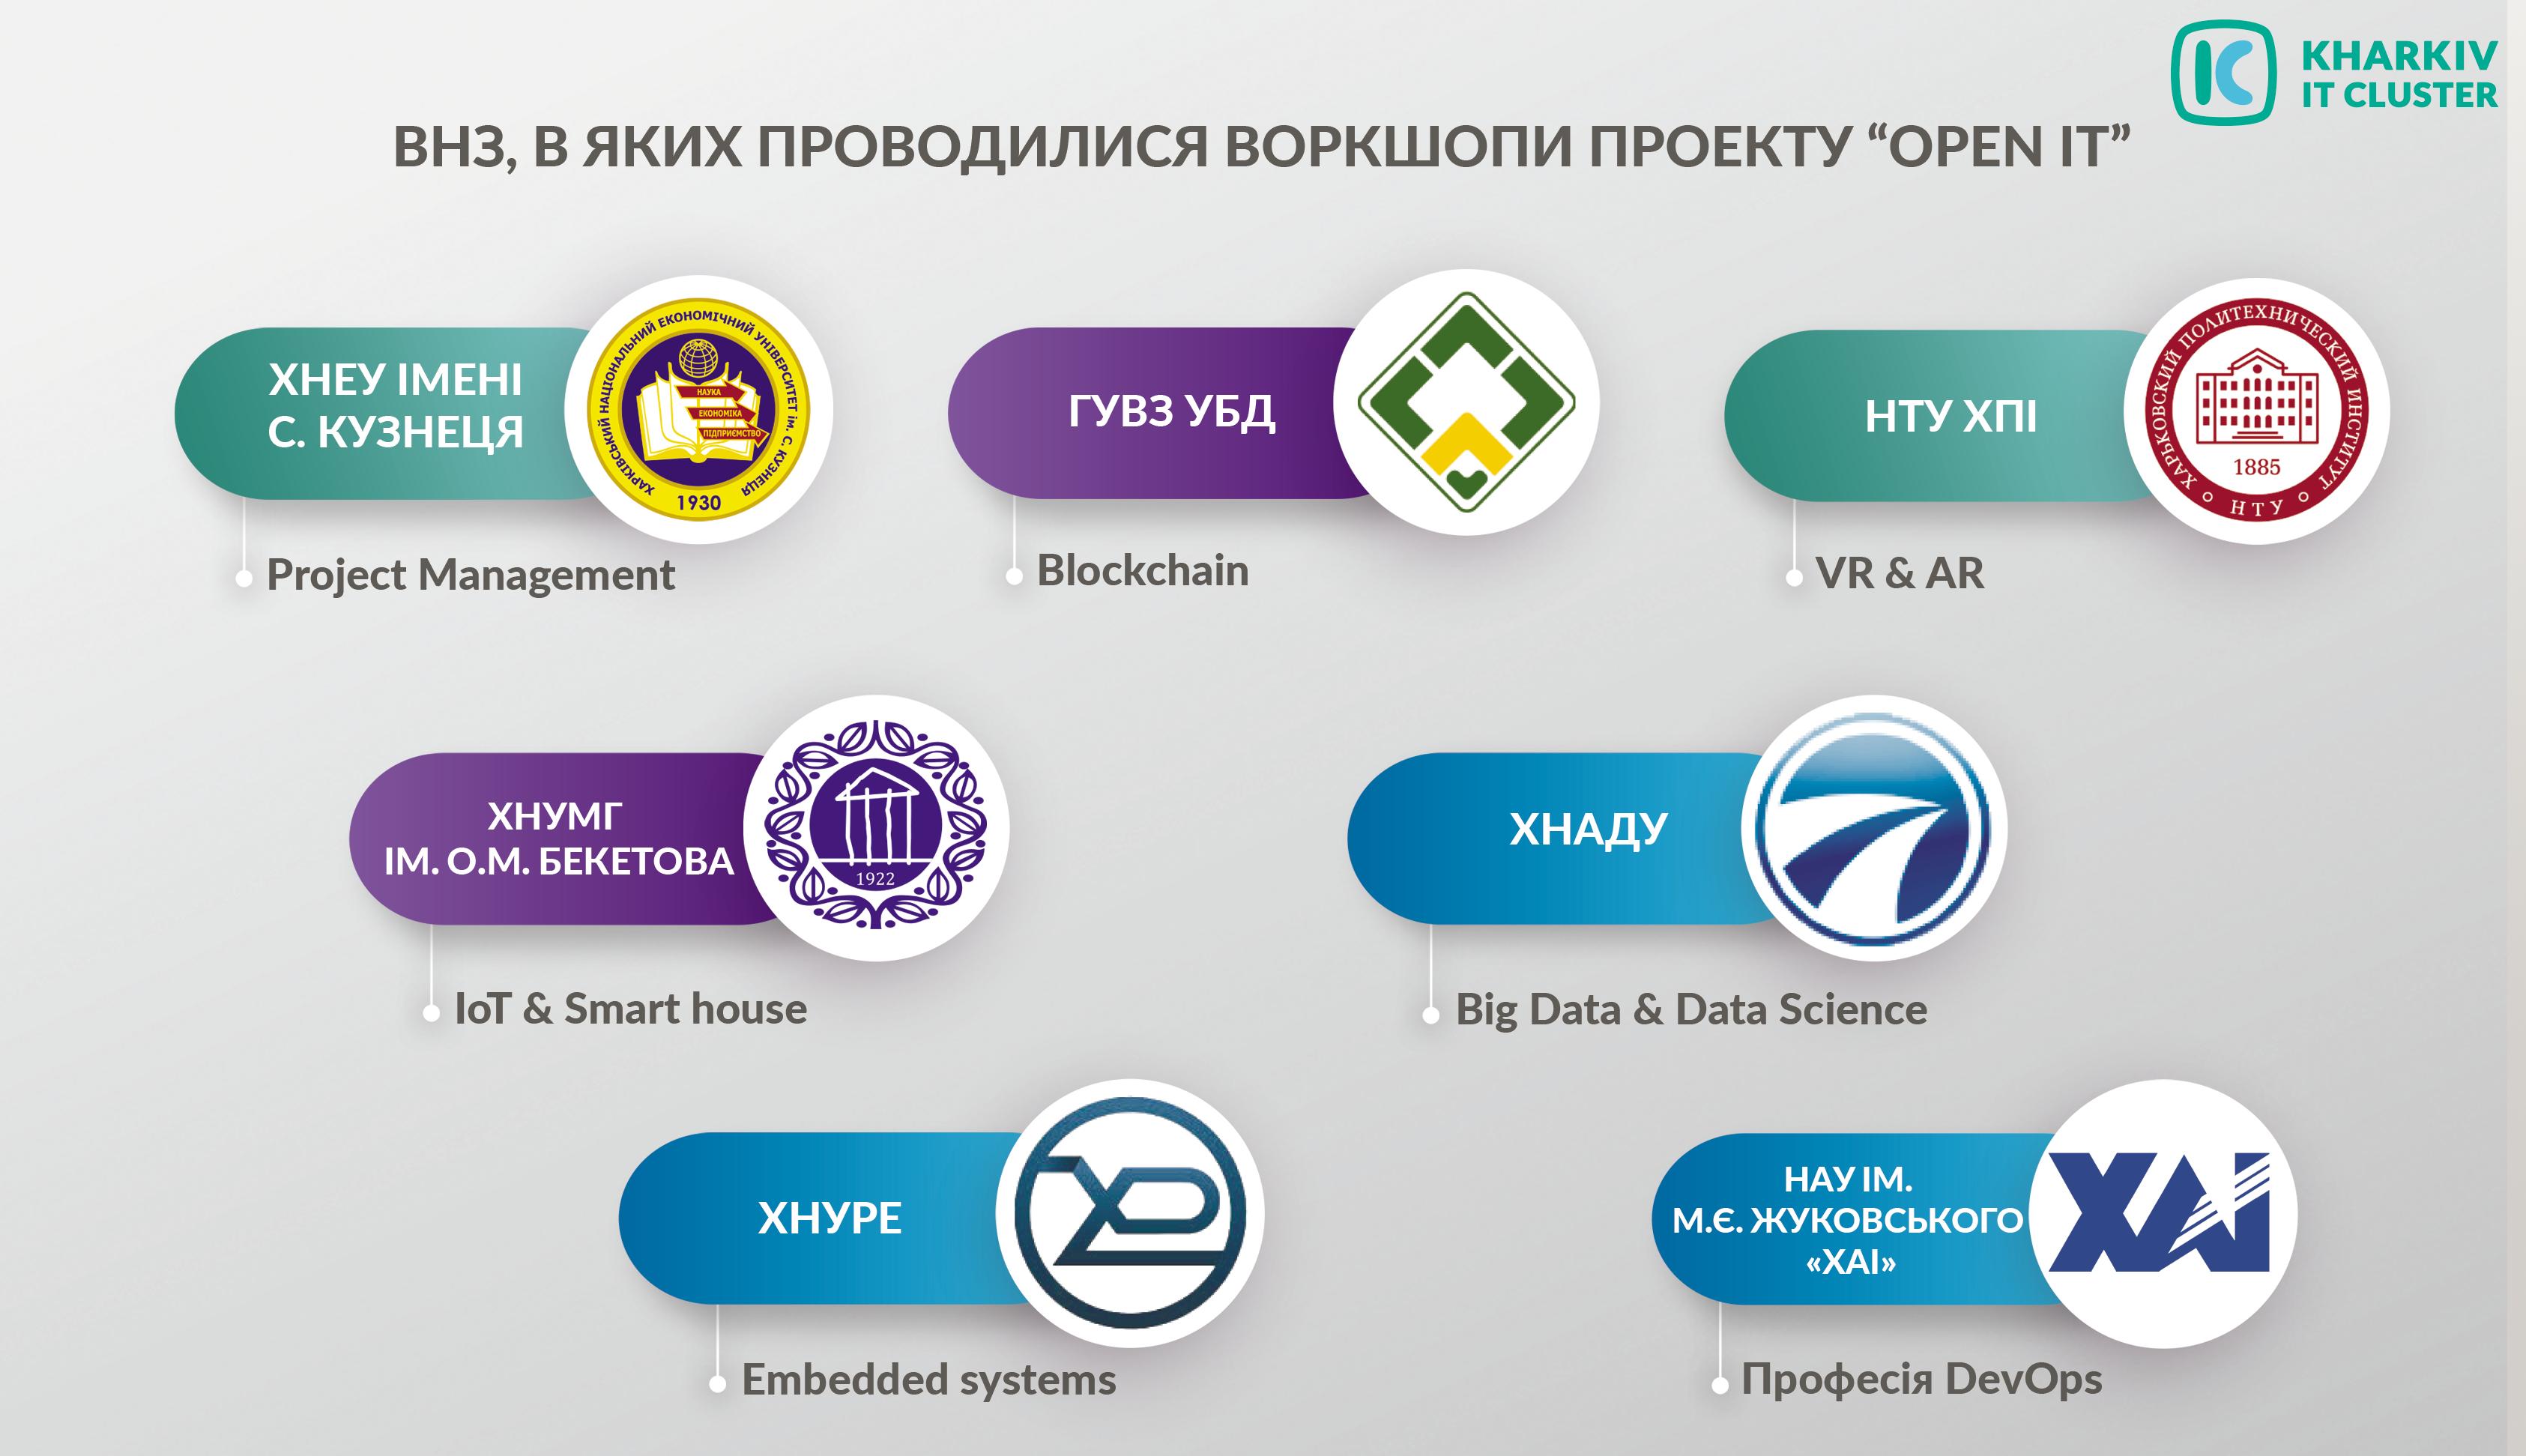 infographics2.1 Доступно о трендах high-tech индустрии: итоги и перспективы проекта Open IT